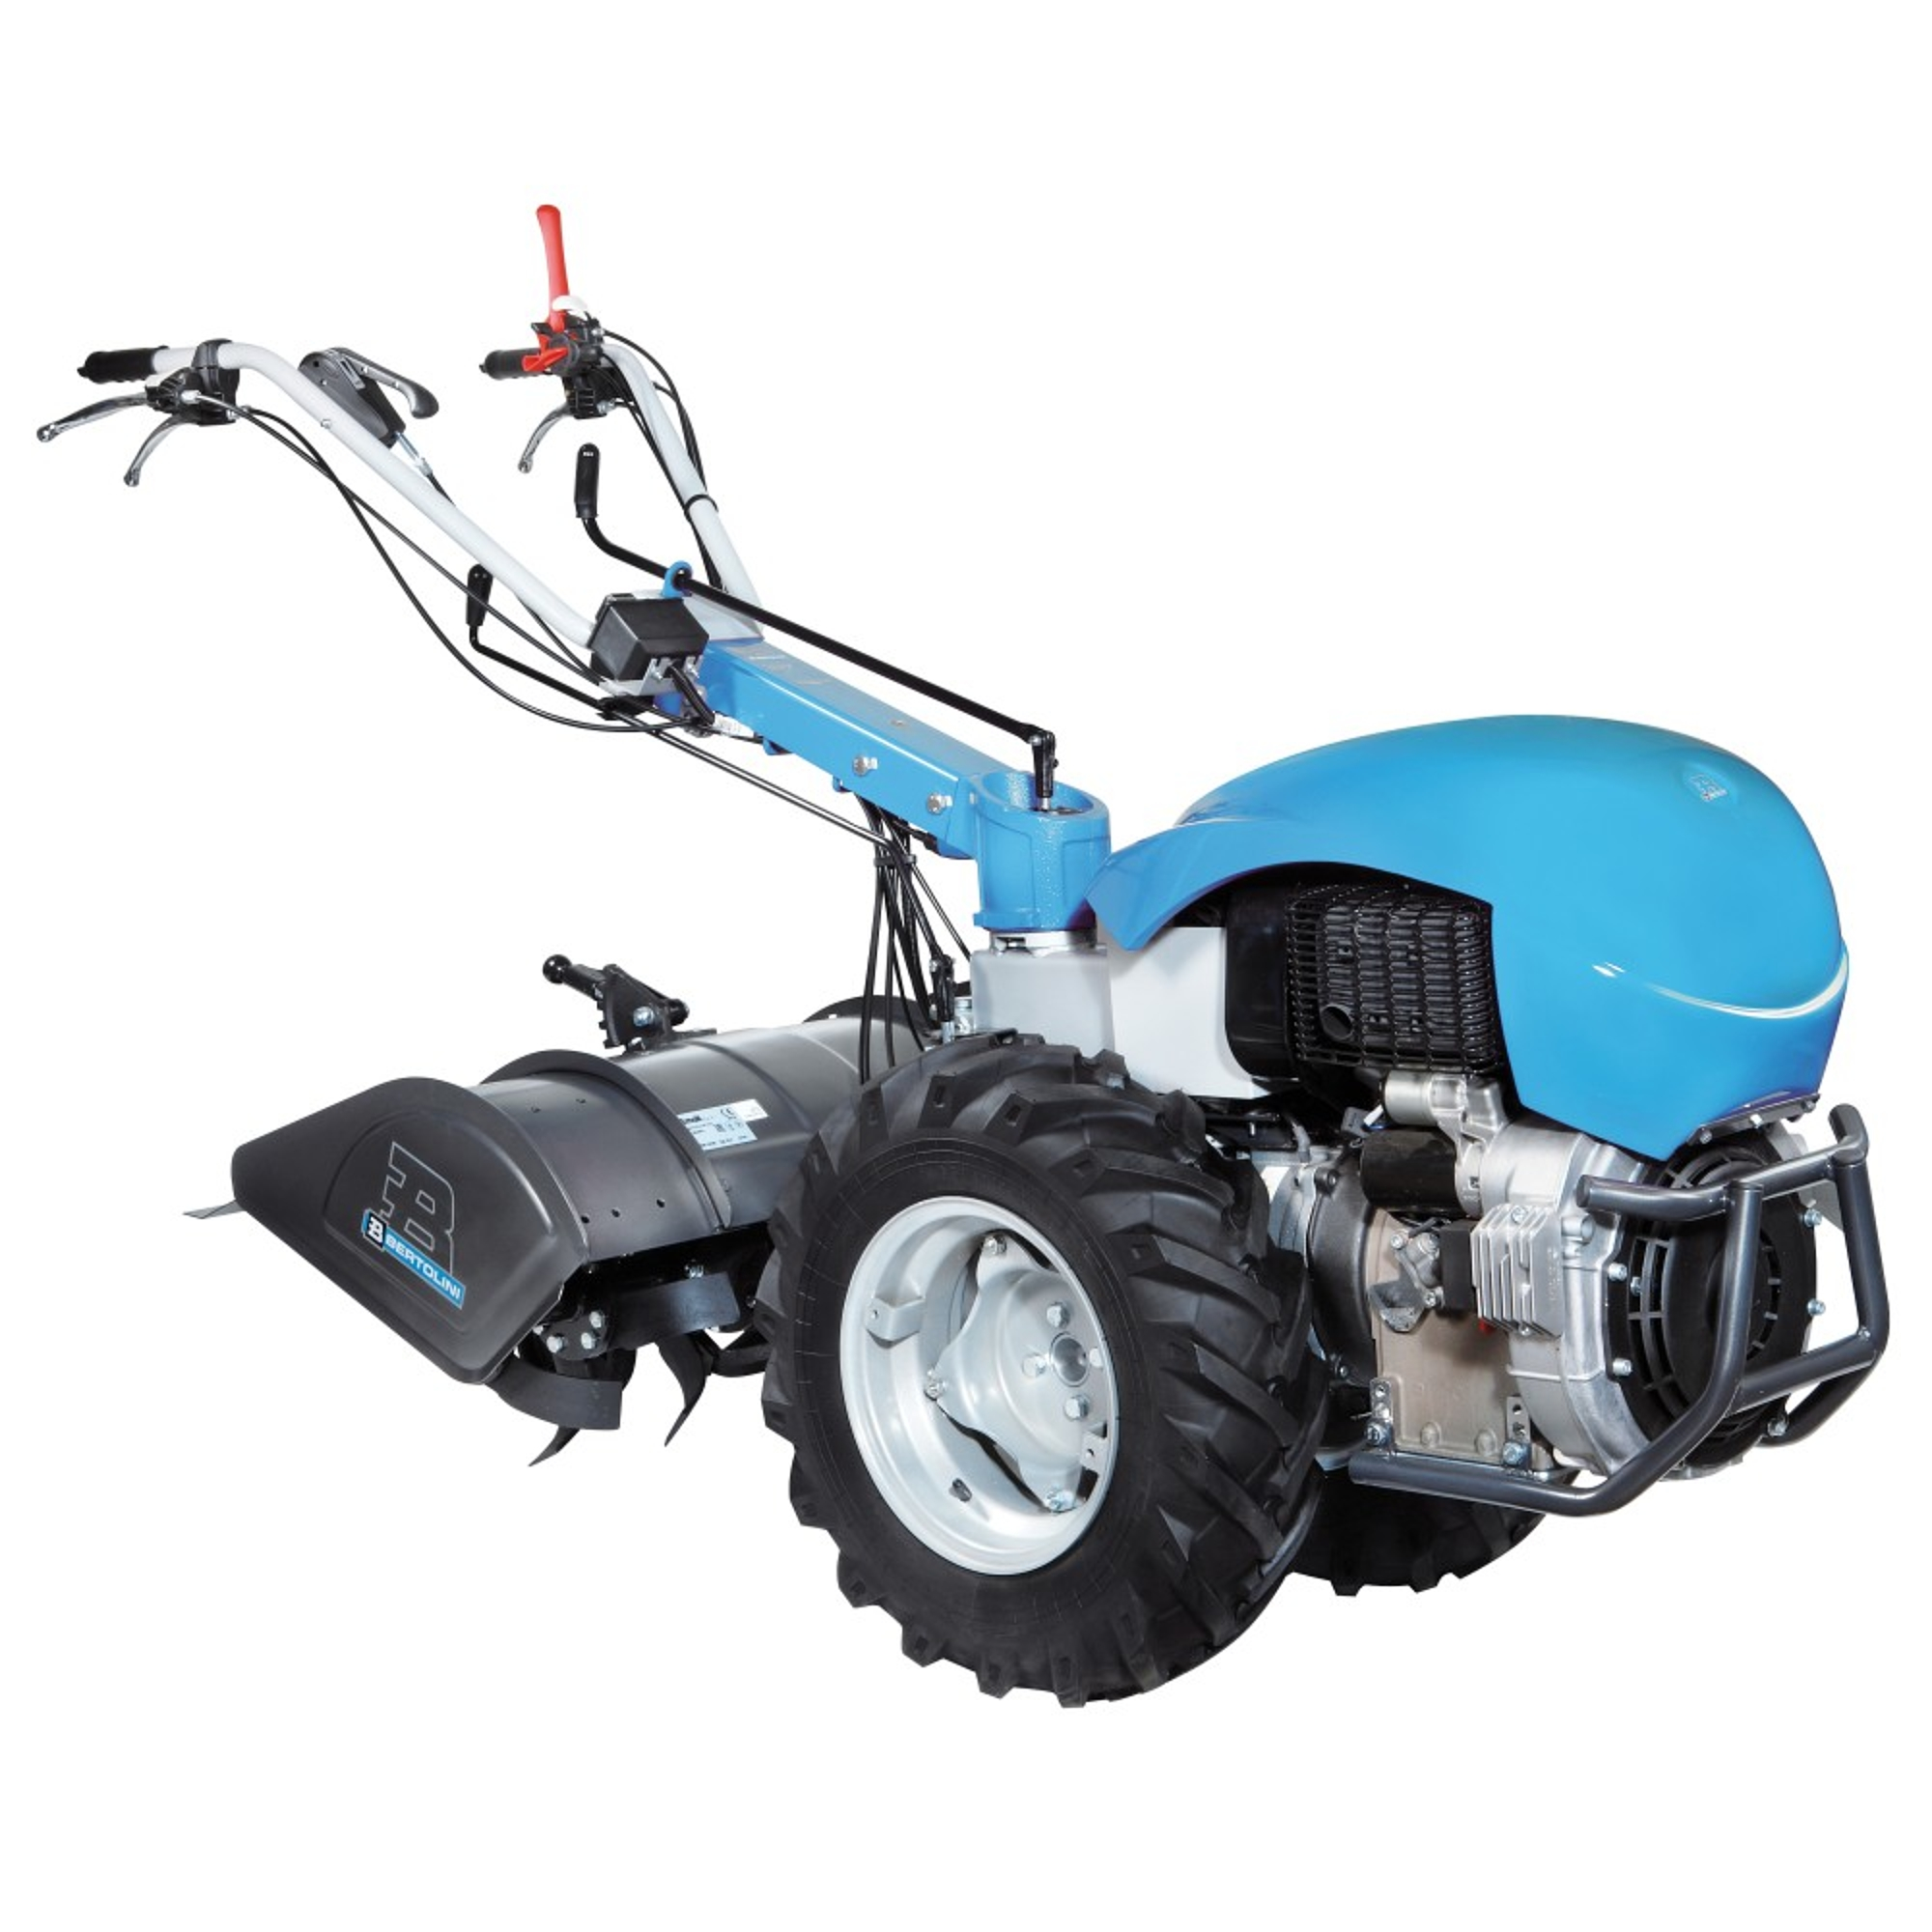 Bertolini Kultivátor Alapgép BT 417 S Kohler CH 395 OHV motorral 68339116EN